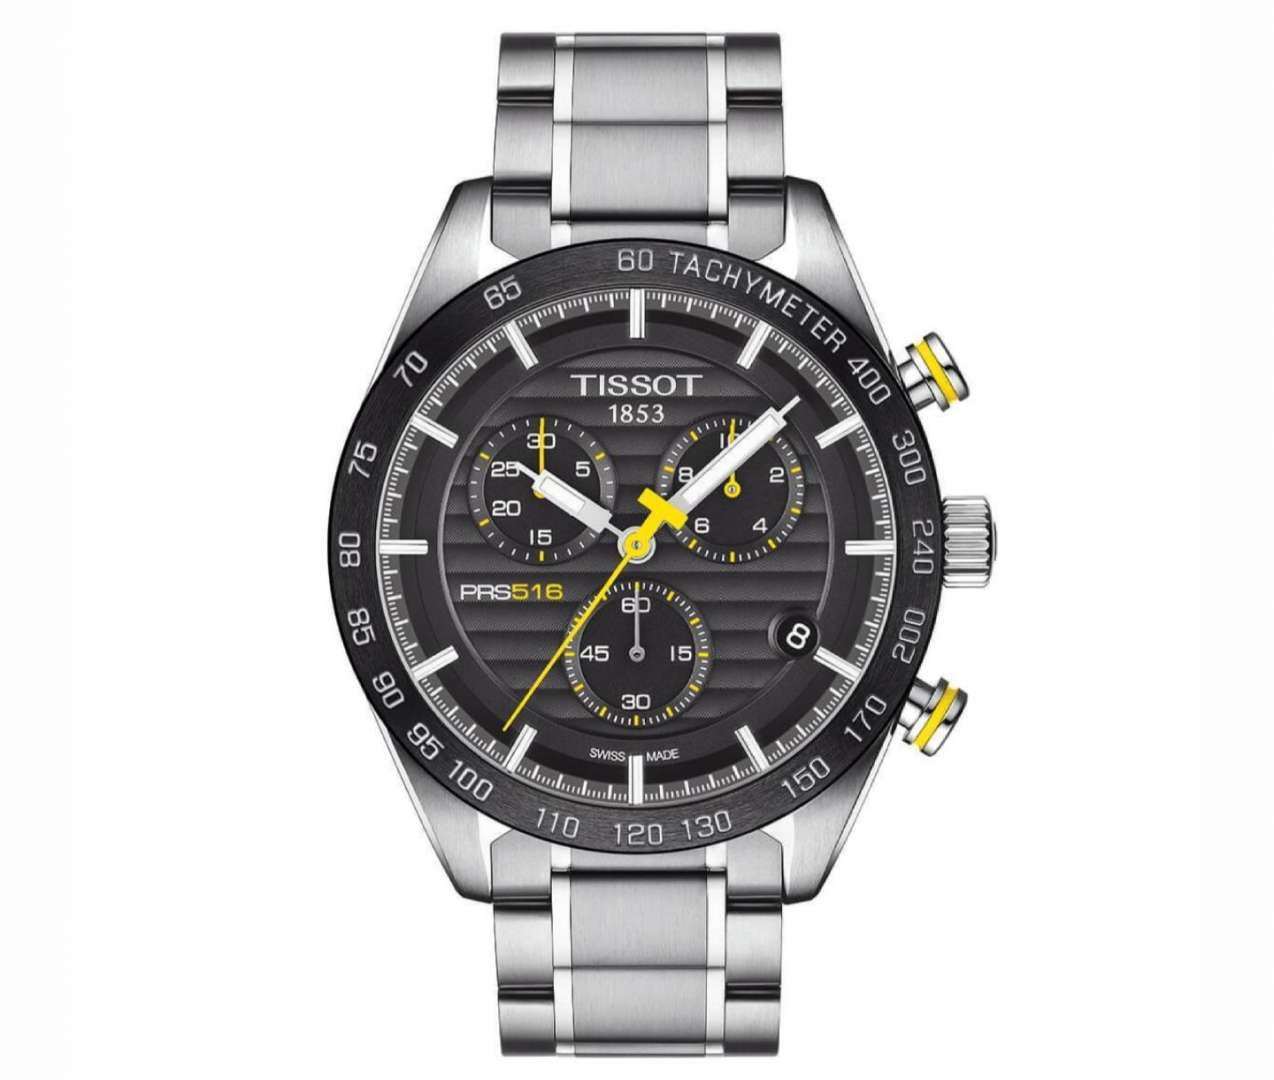 שעון יד אנלוגי tissot t100.417.11.051.00 טיסו